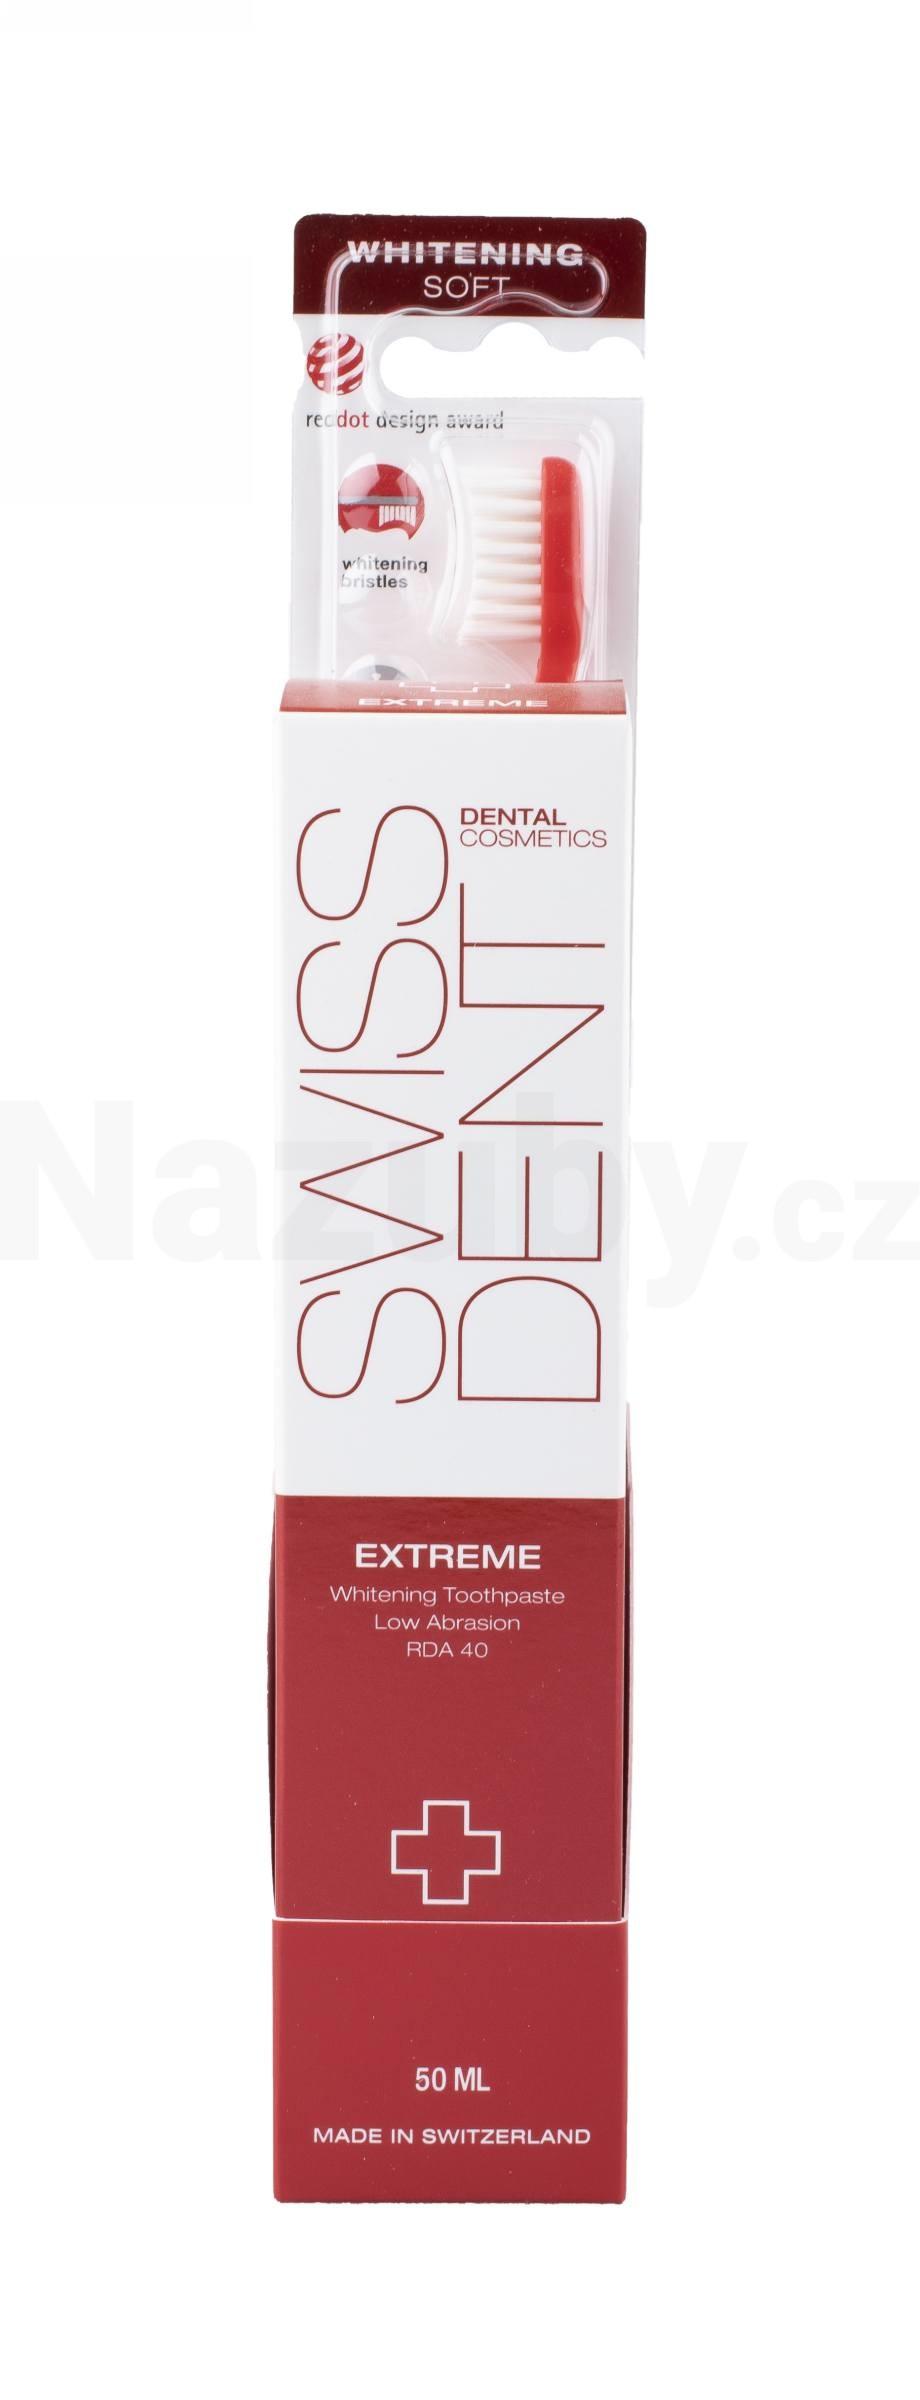 Swissdent sada DUO EXTREME (pasta 50 ml + zdarma Whitening kartáček ve stojánku)